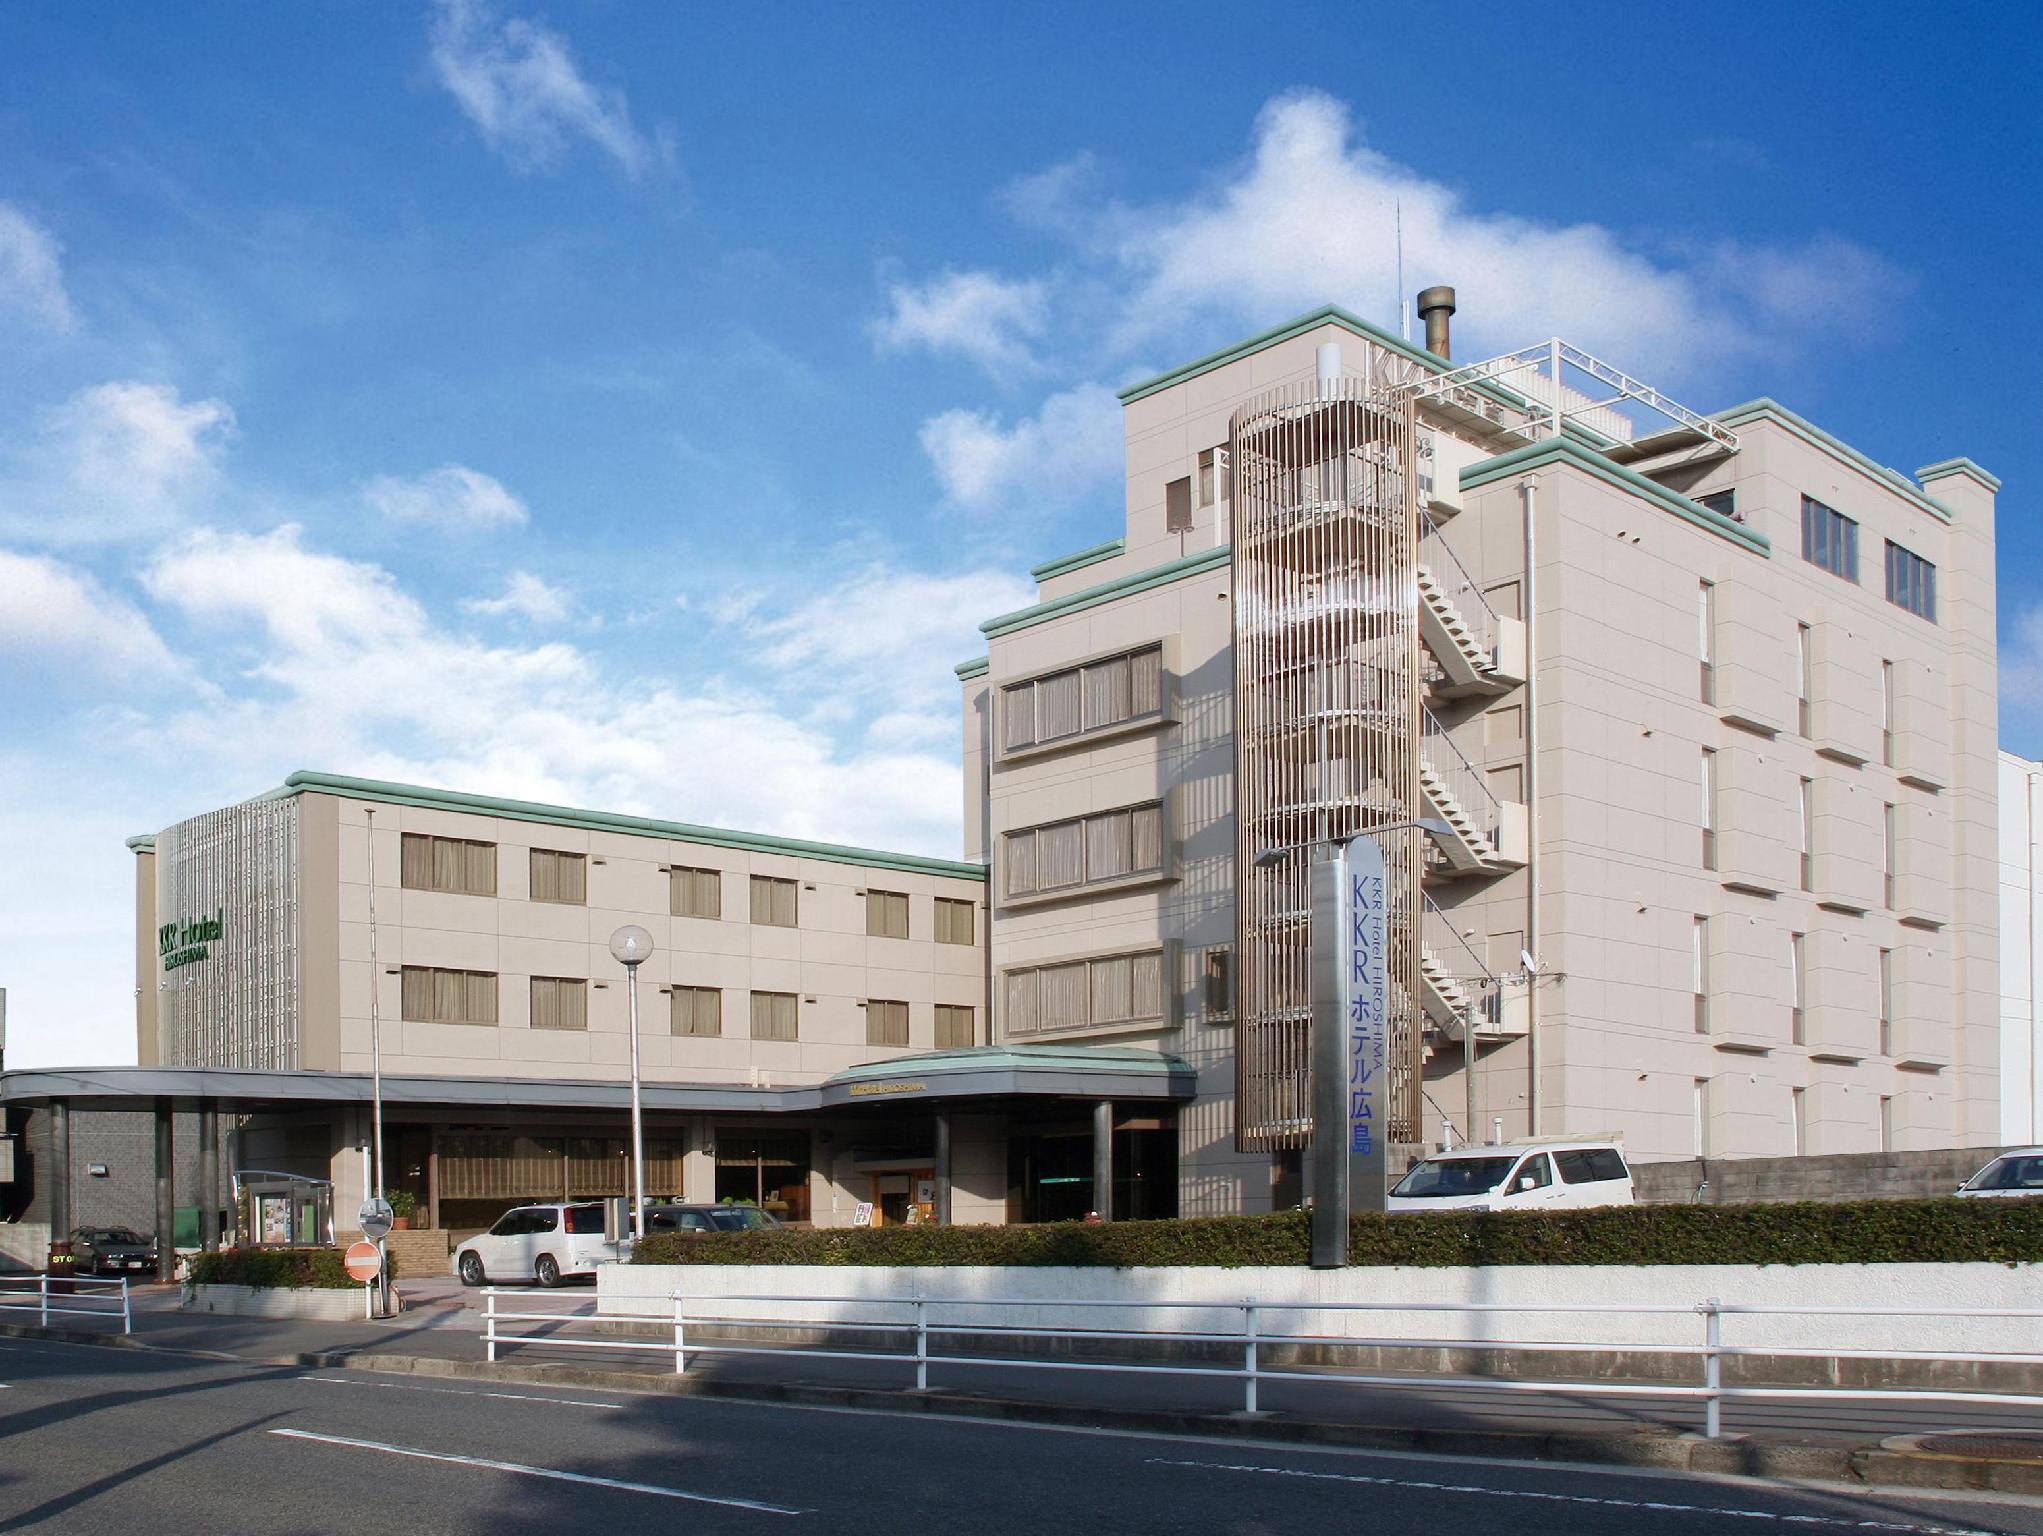 KKR Hotel Hiroshima